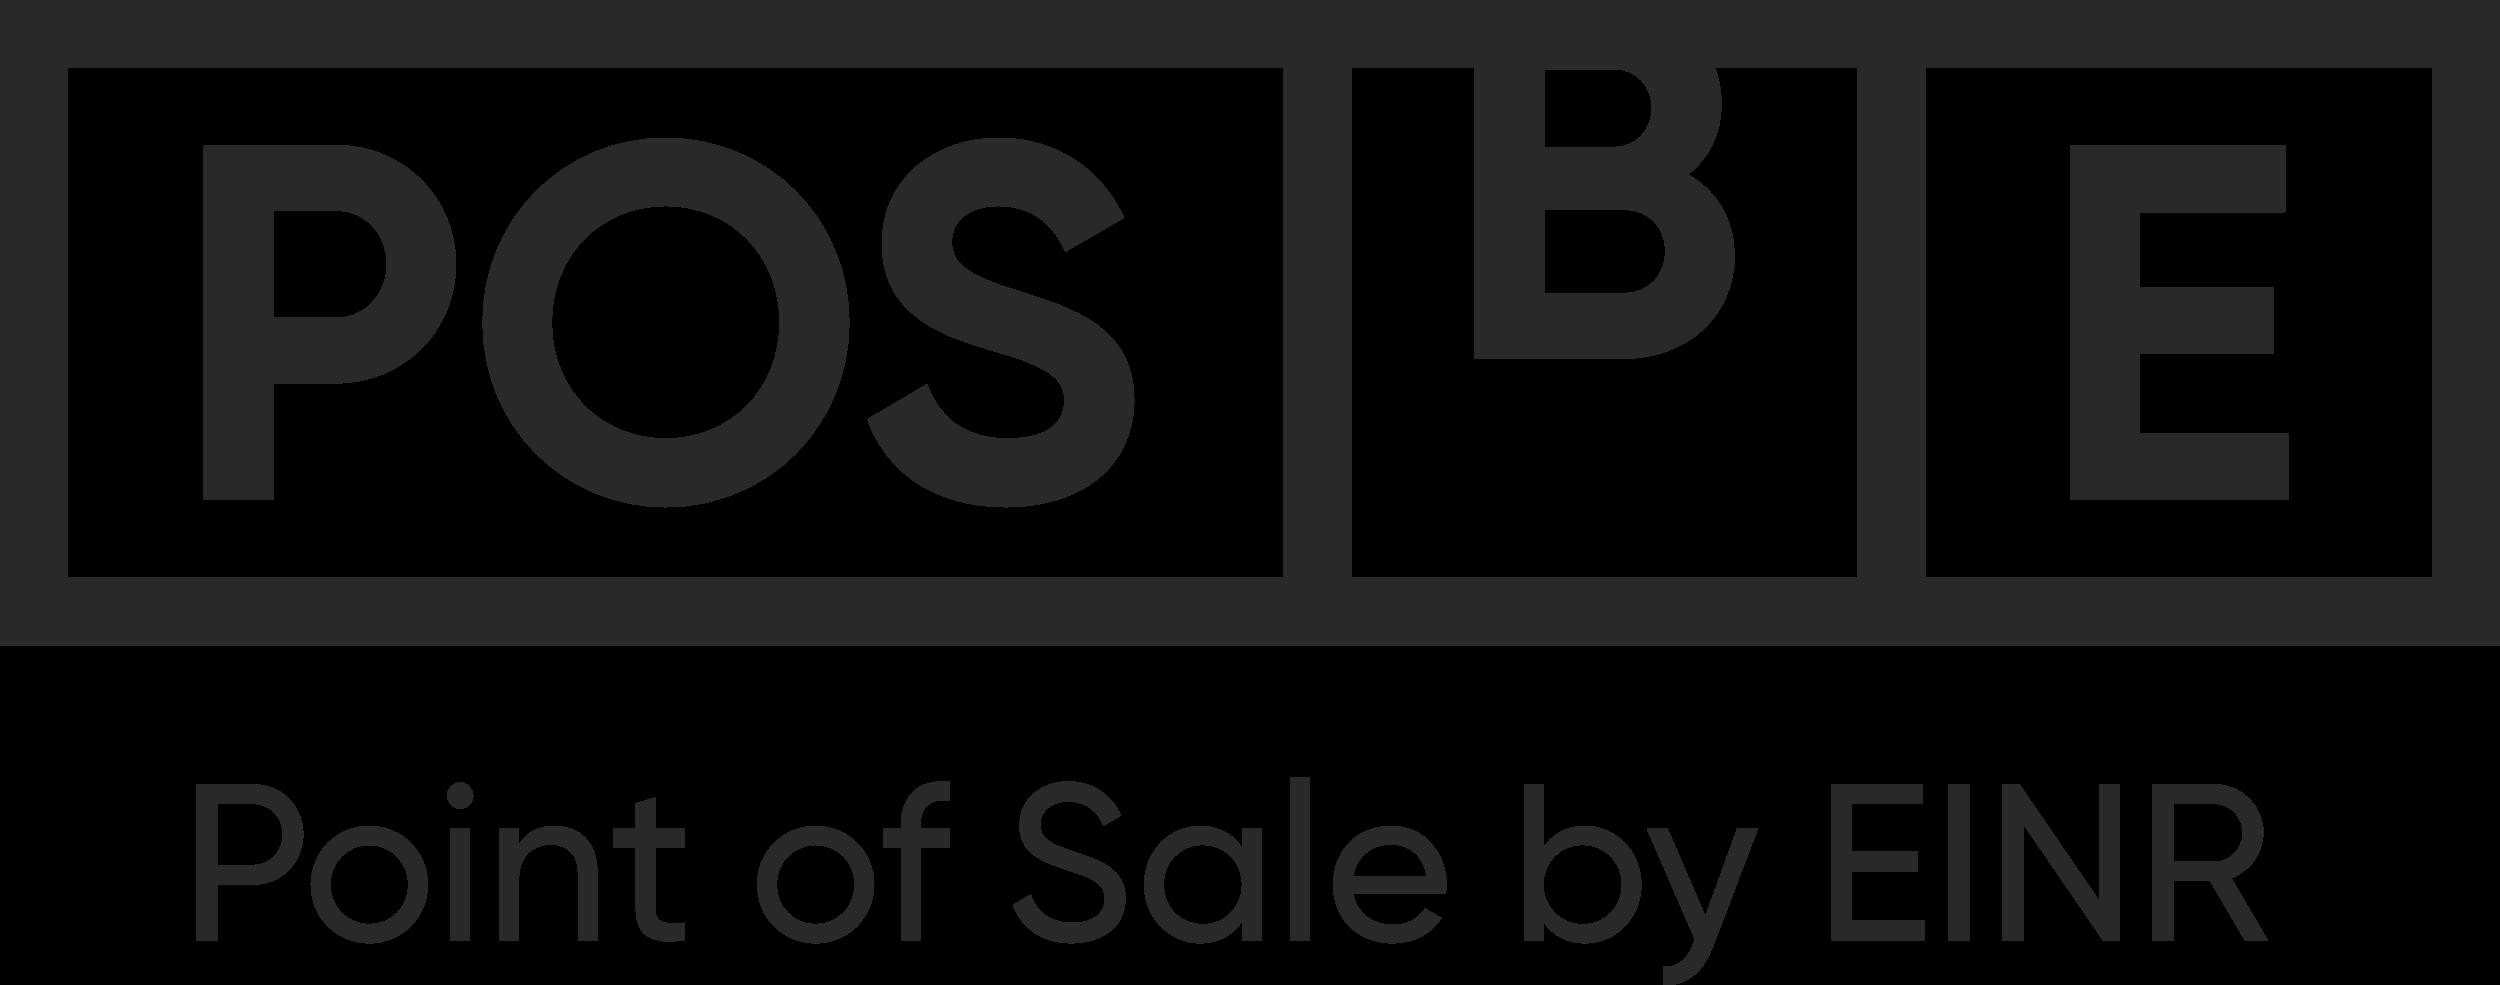 POSBE logo